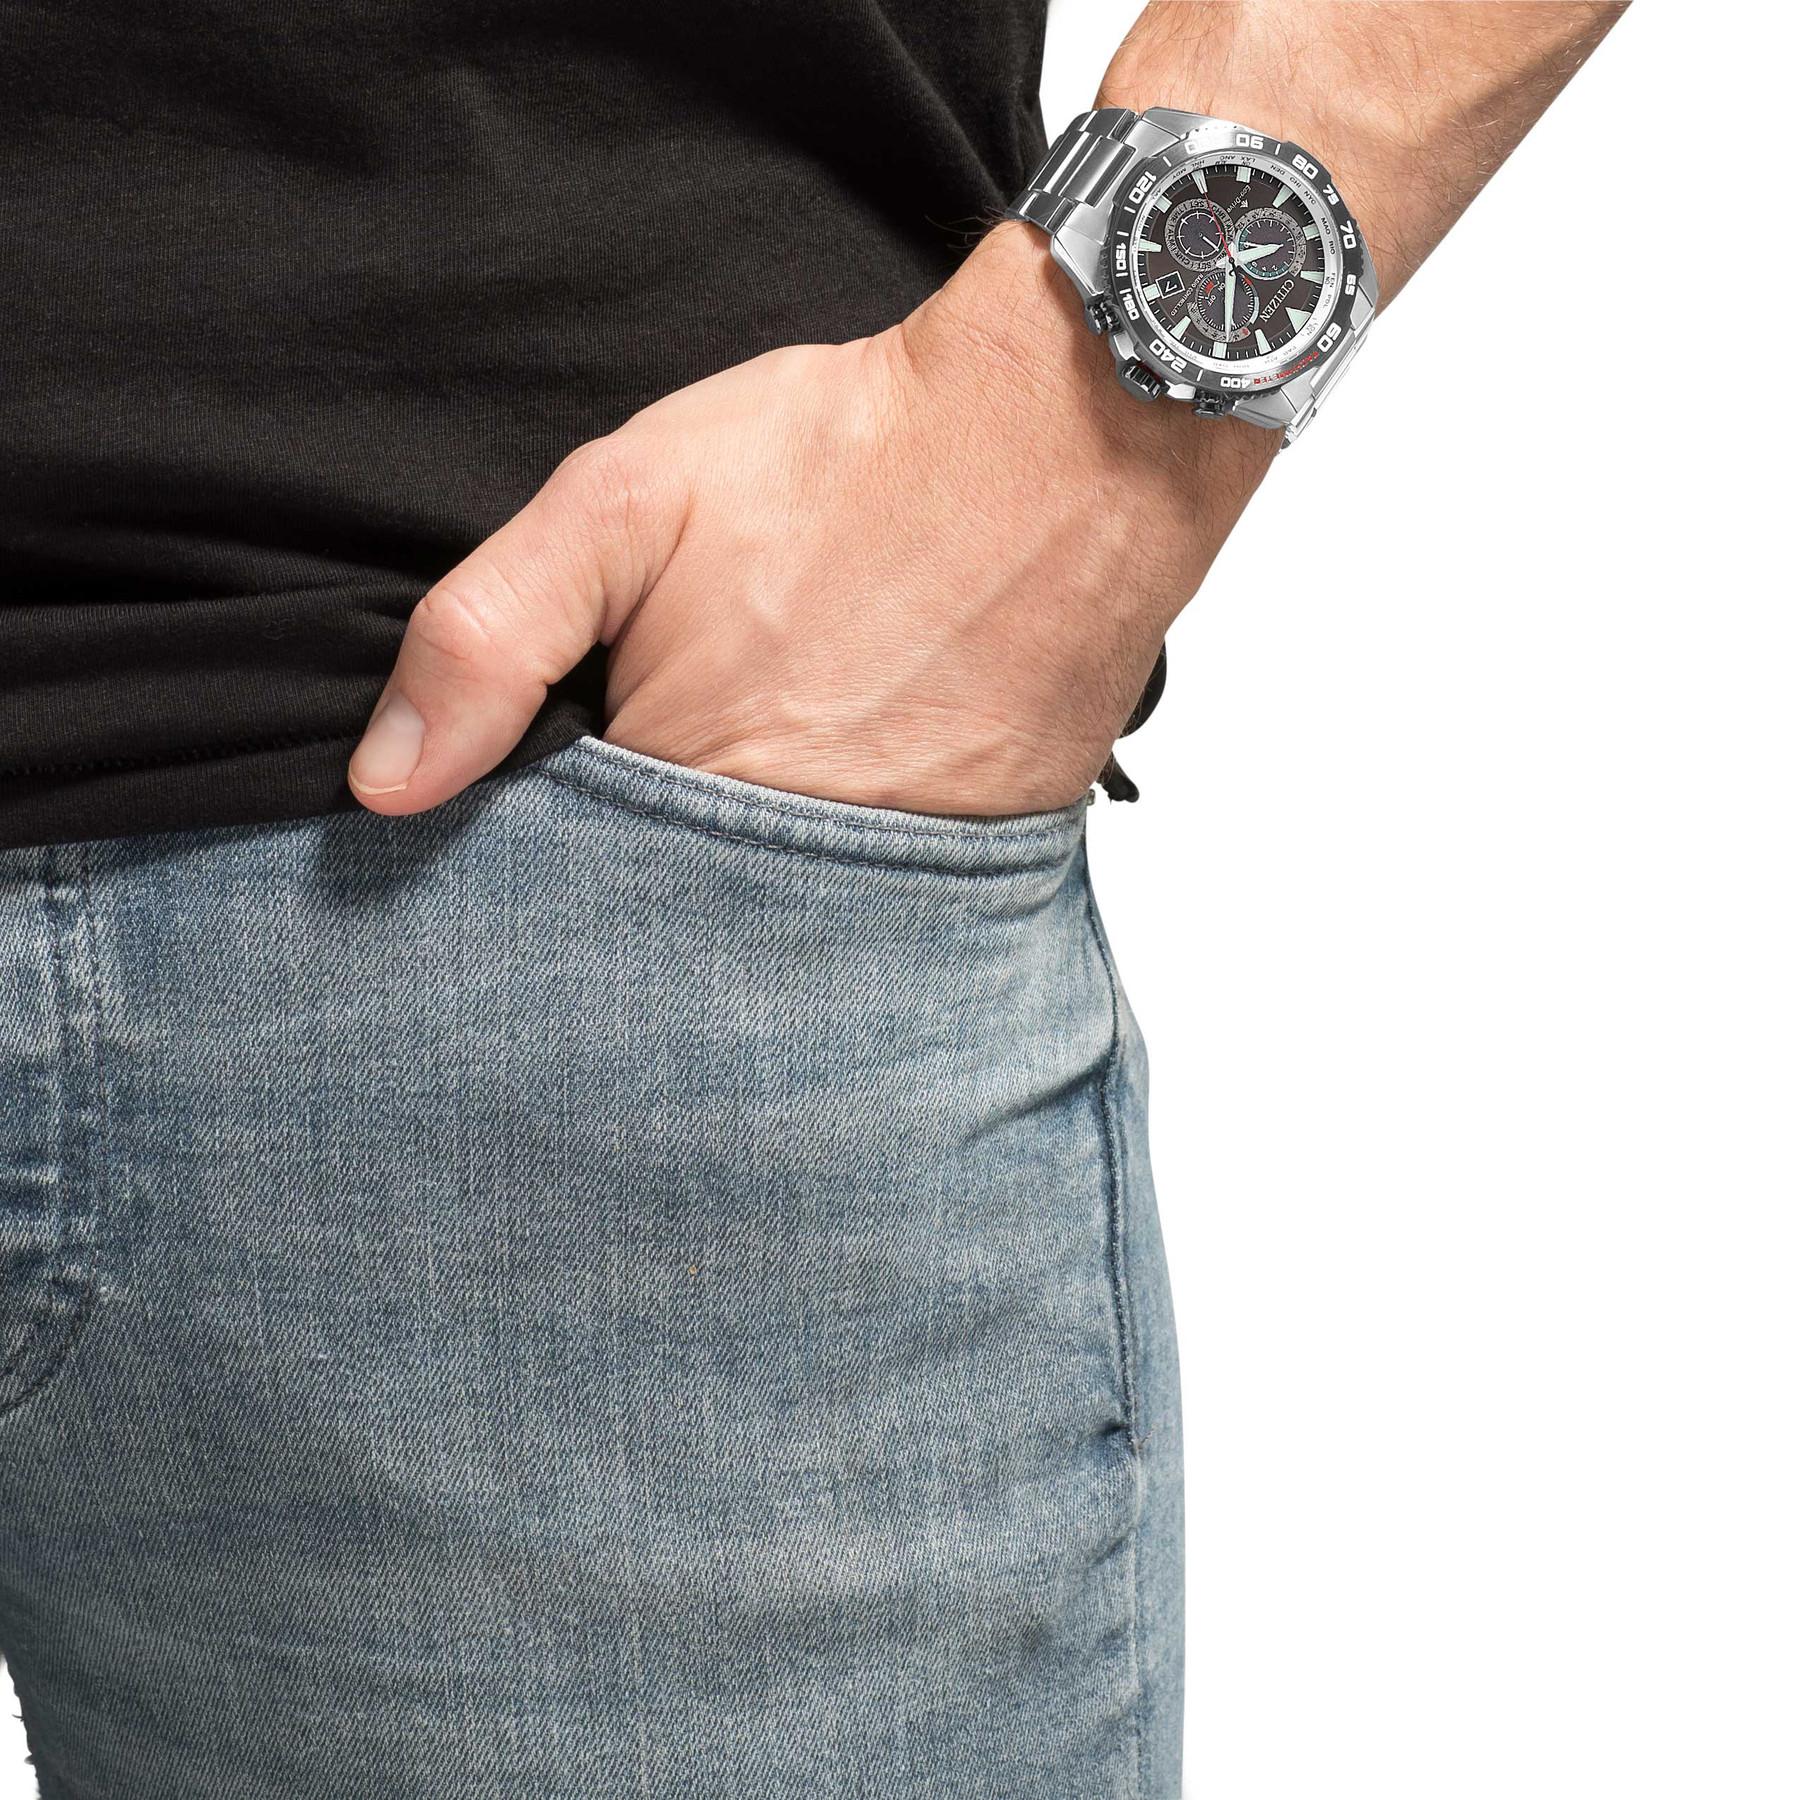 Citizen Promaster Eco Drive Funksolar Chrono CB5036 87X CB5036 aus Edelstahl | Armbanduhren kaufen im Unger Uhren Shop mit Niedrigpreisgarantie